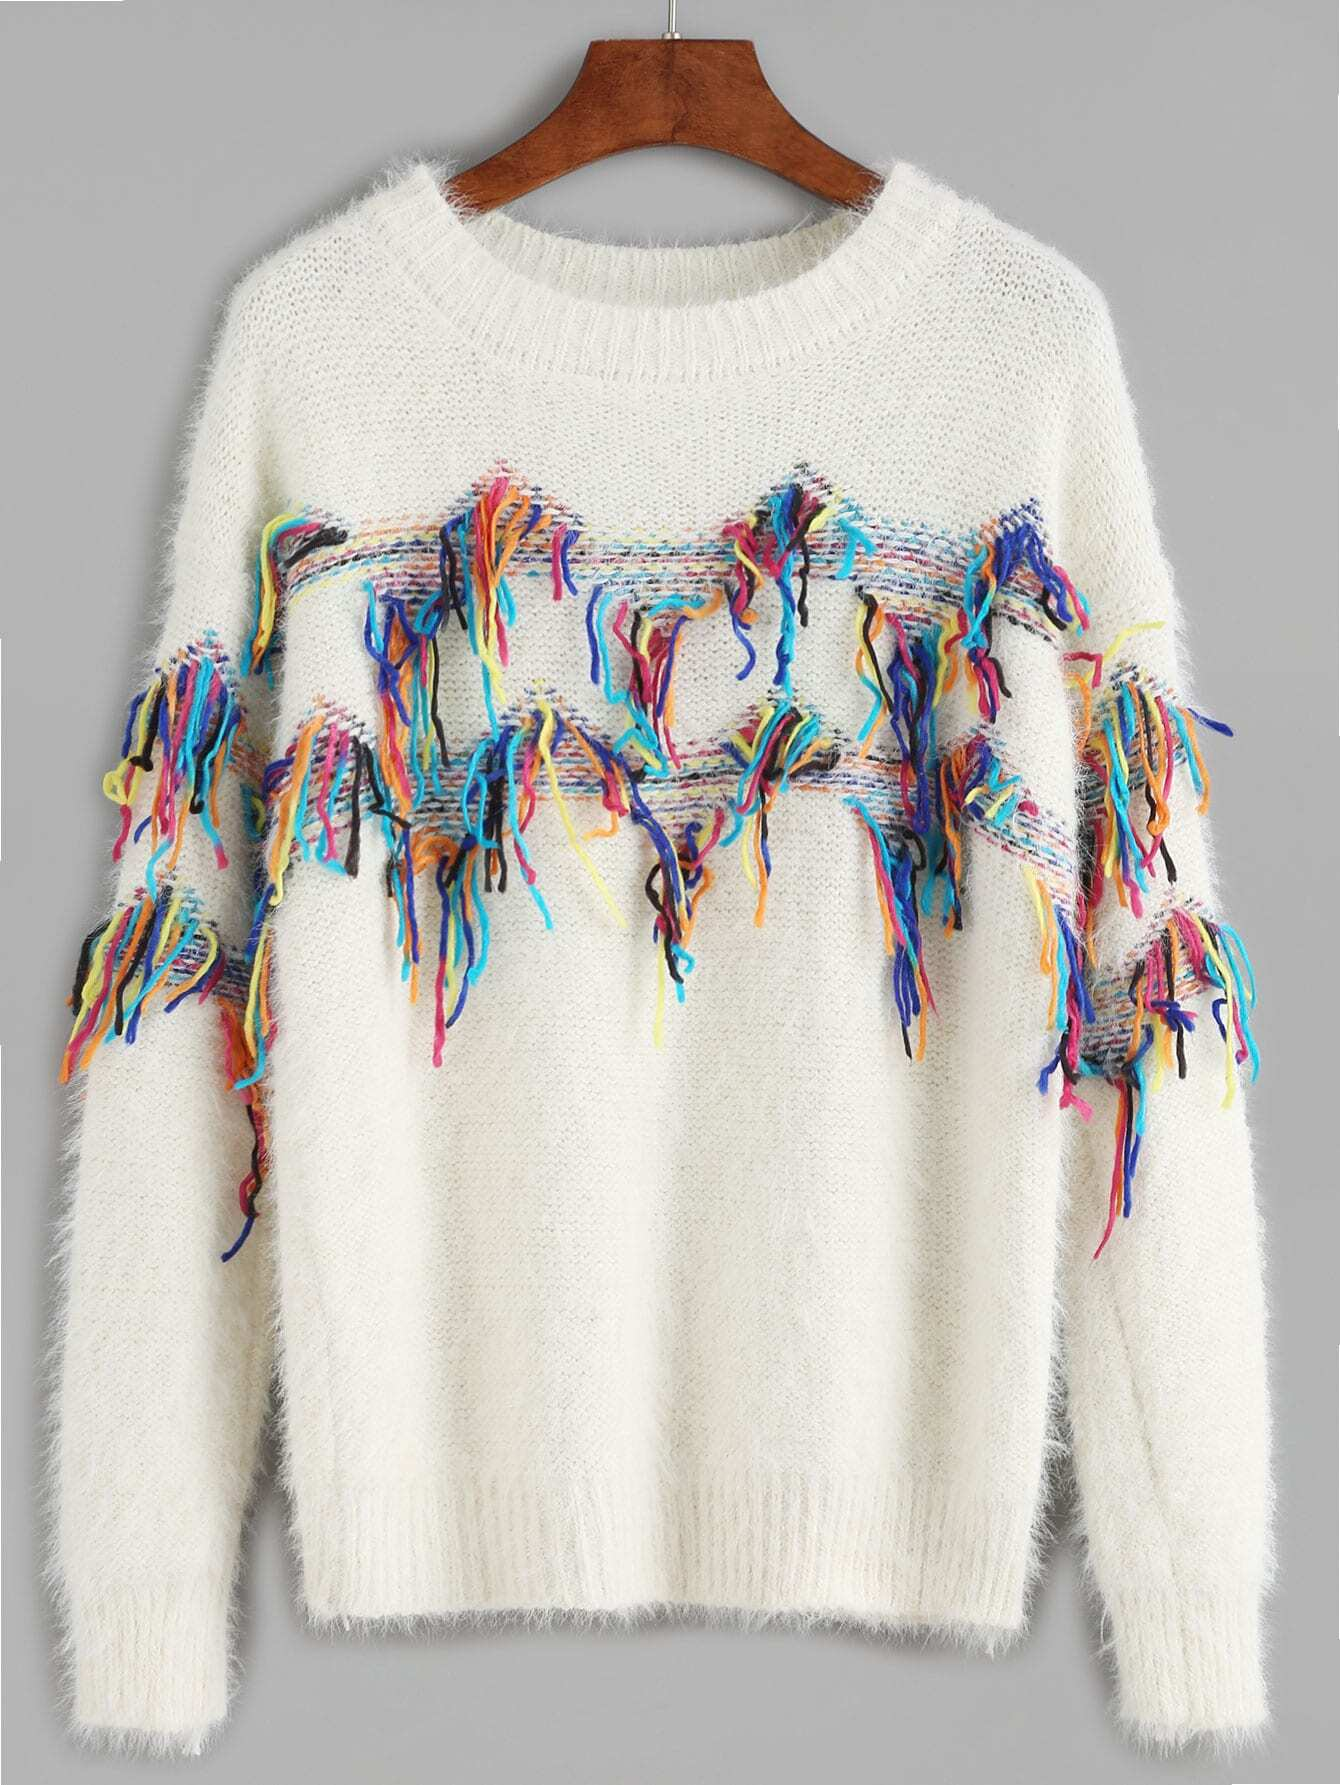 White Fringe Trim Fuzzy Sweater sweater160916003